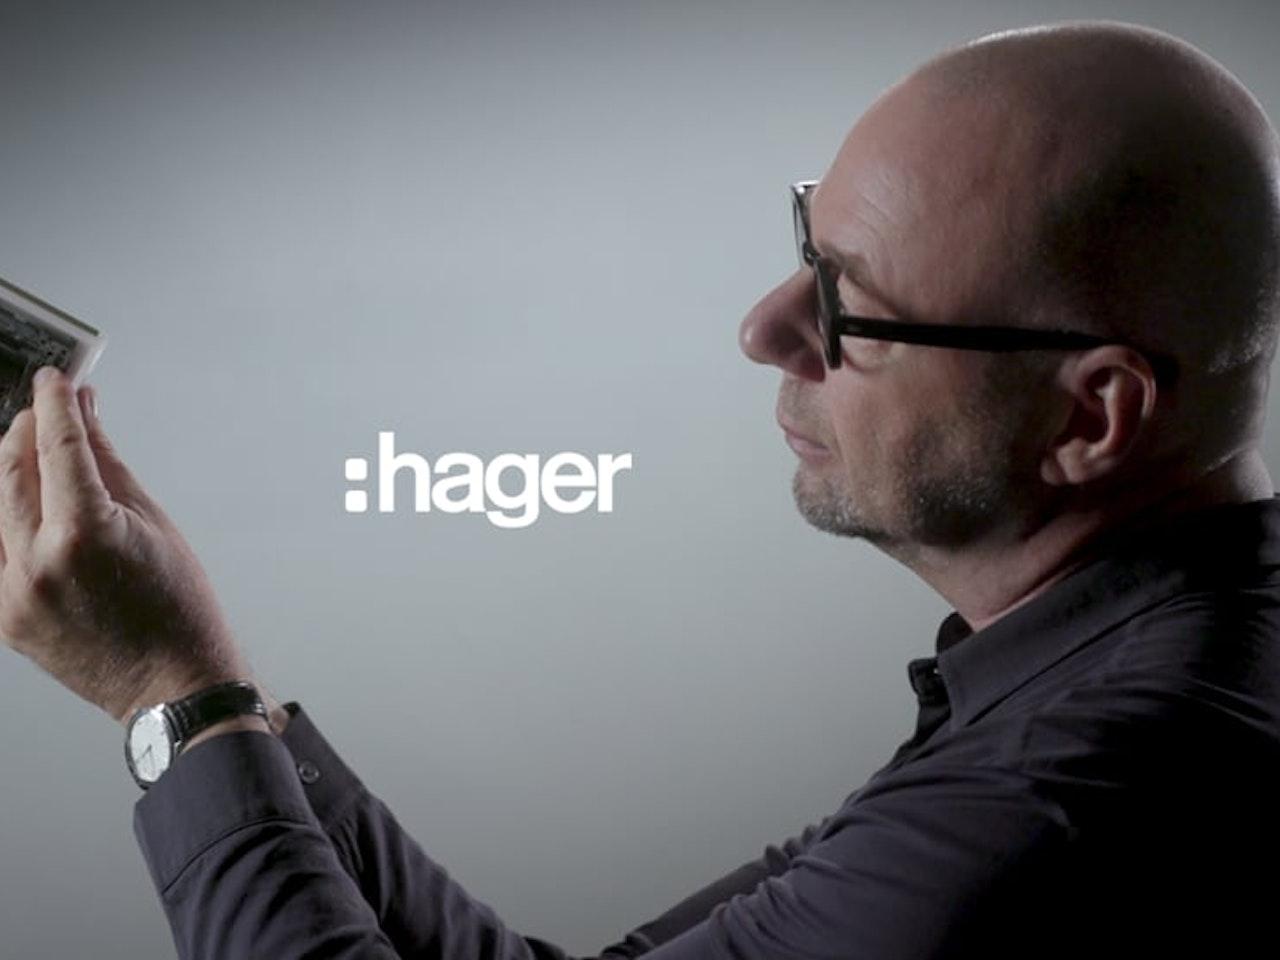 gallery, le design signé Hager